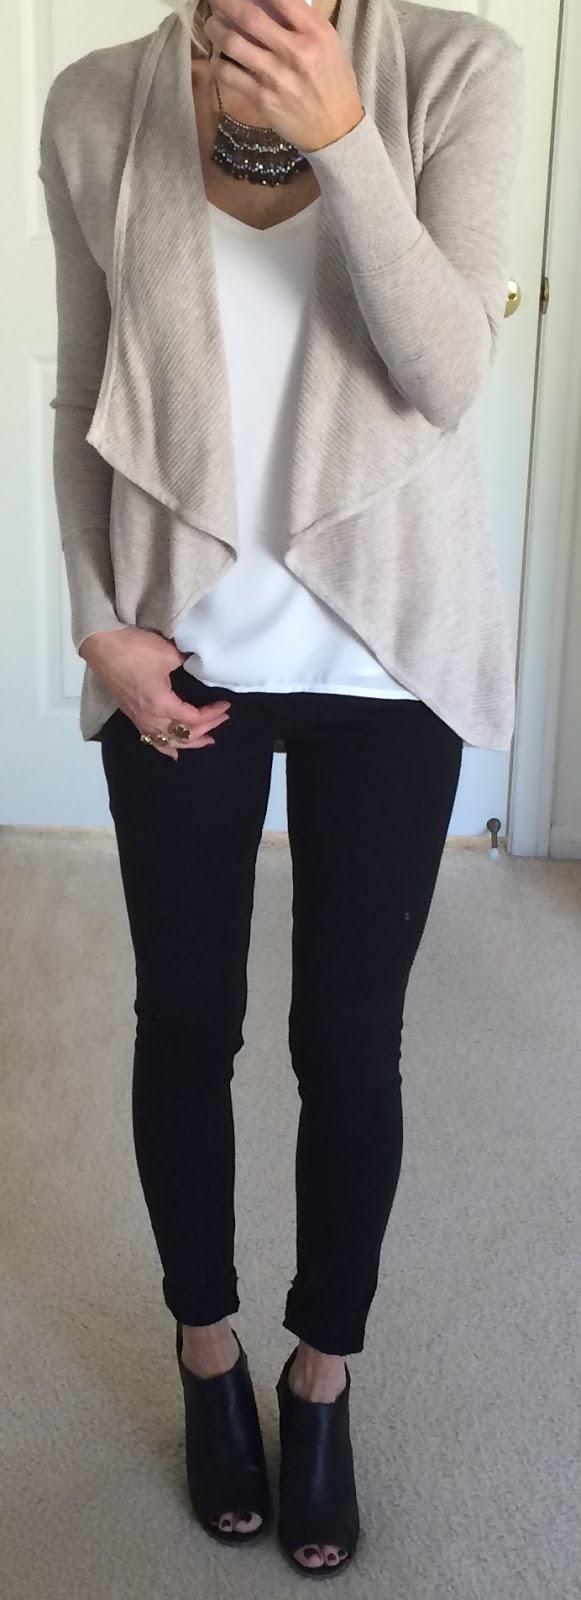 Singel Dejt Outfit